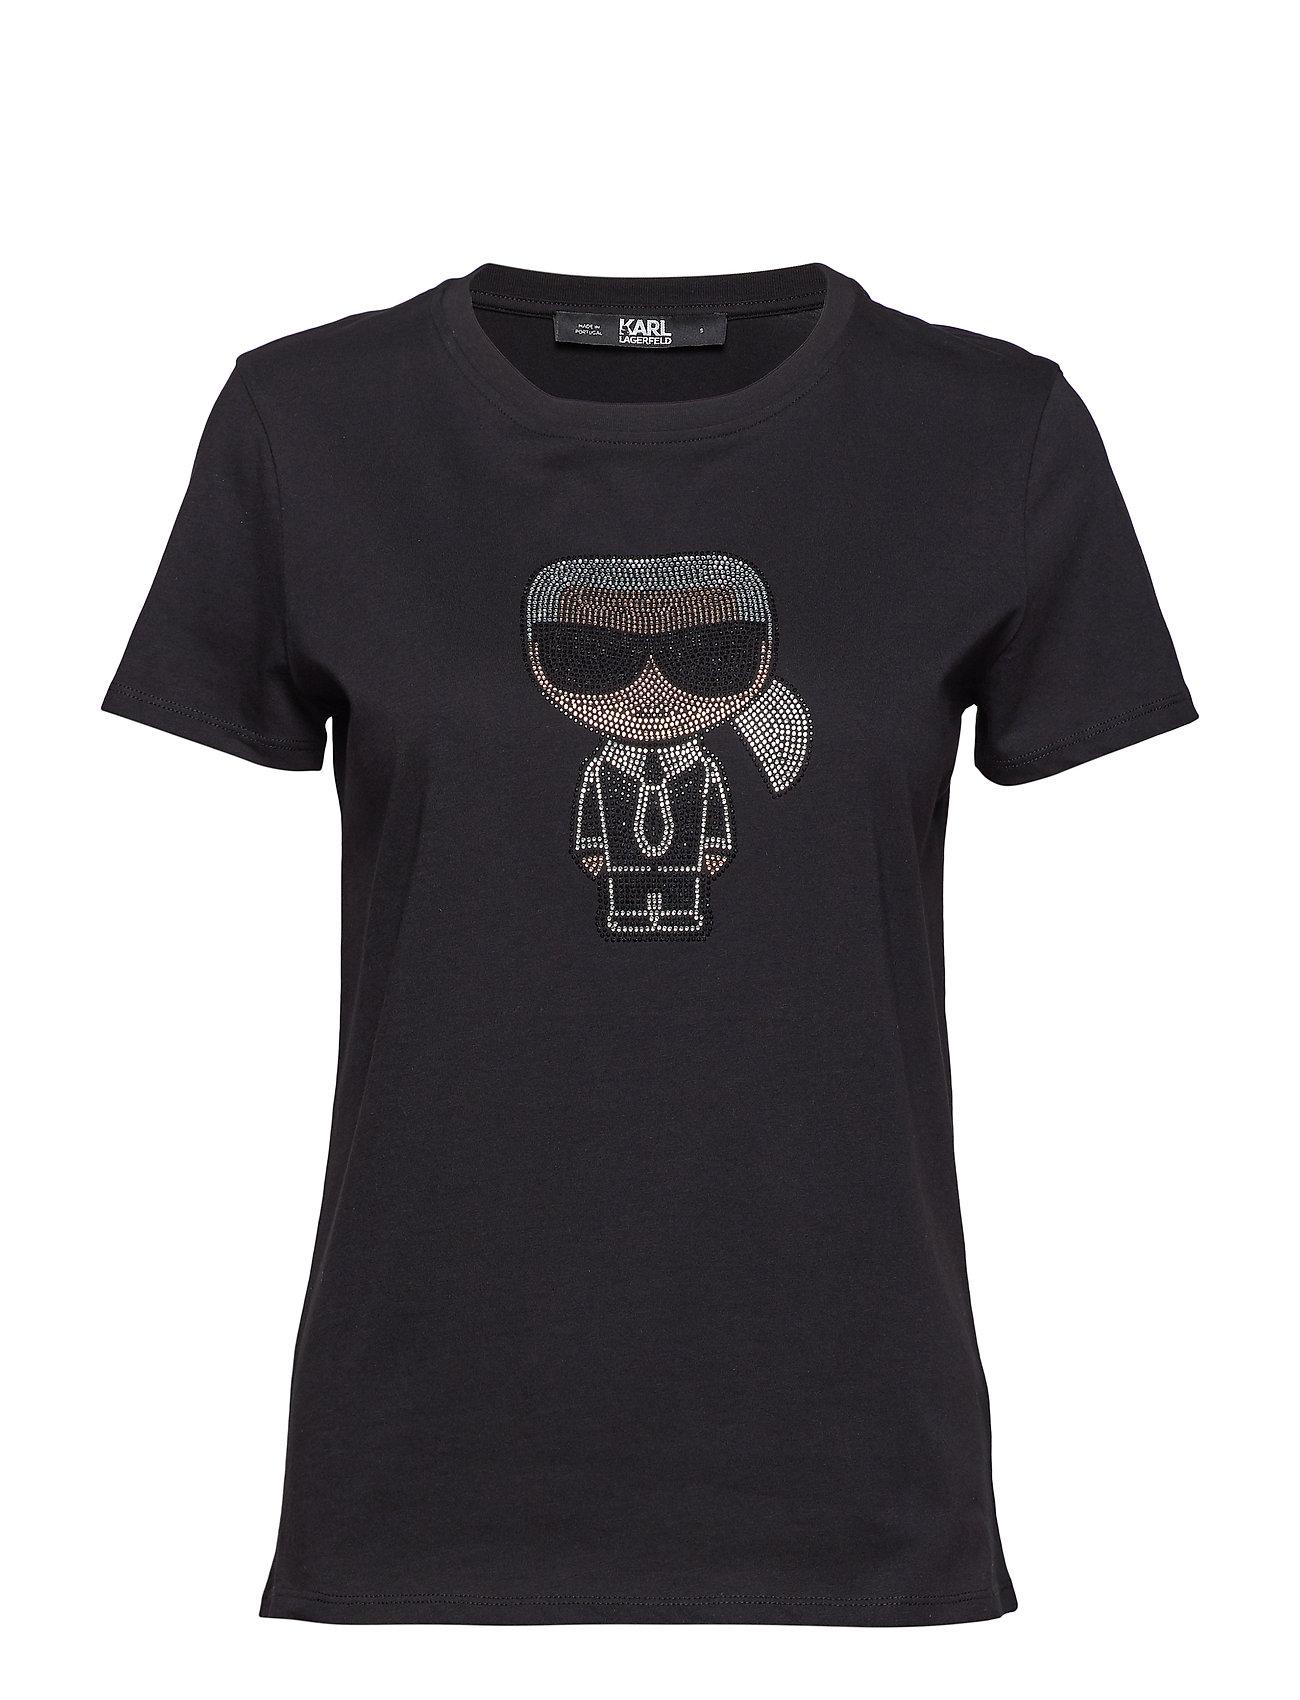 Karl Lagerfeld Ikonik Rhinestone Karl T Shirt Ögrönlar